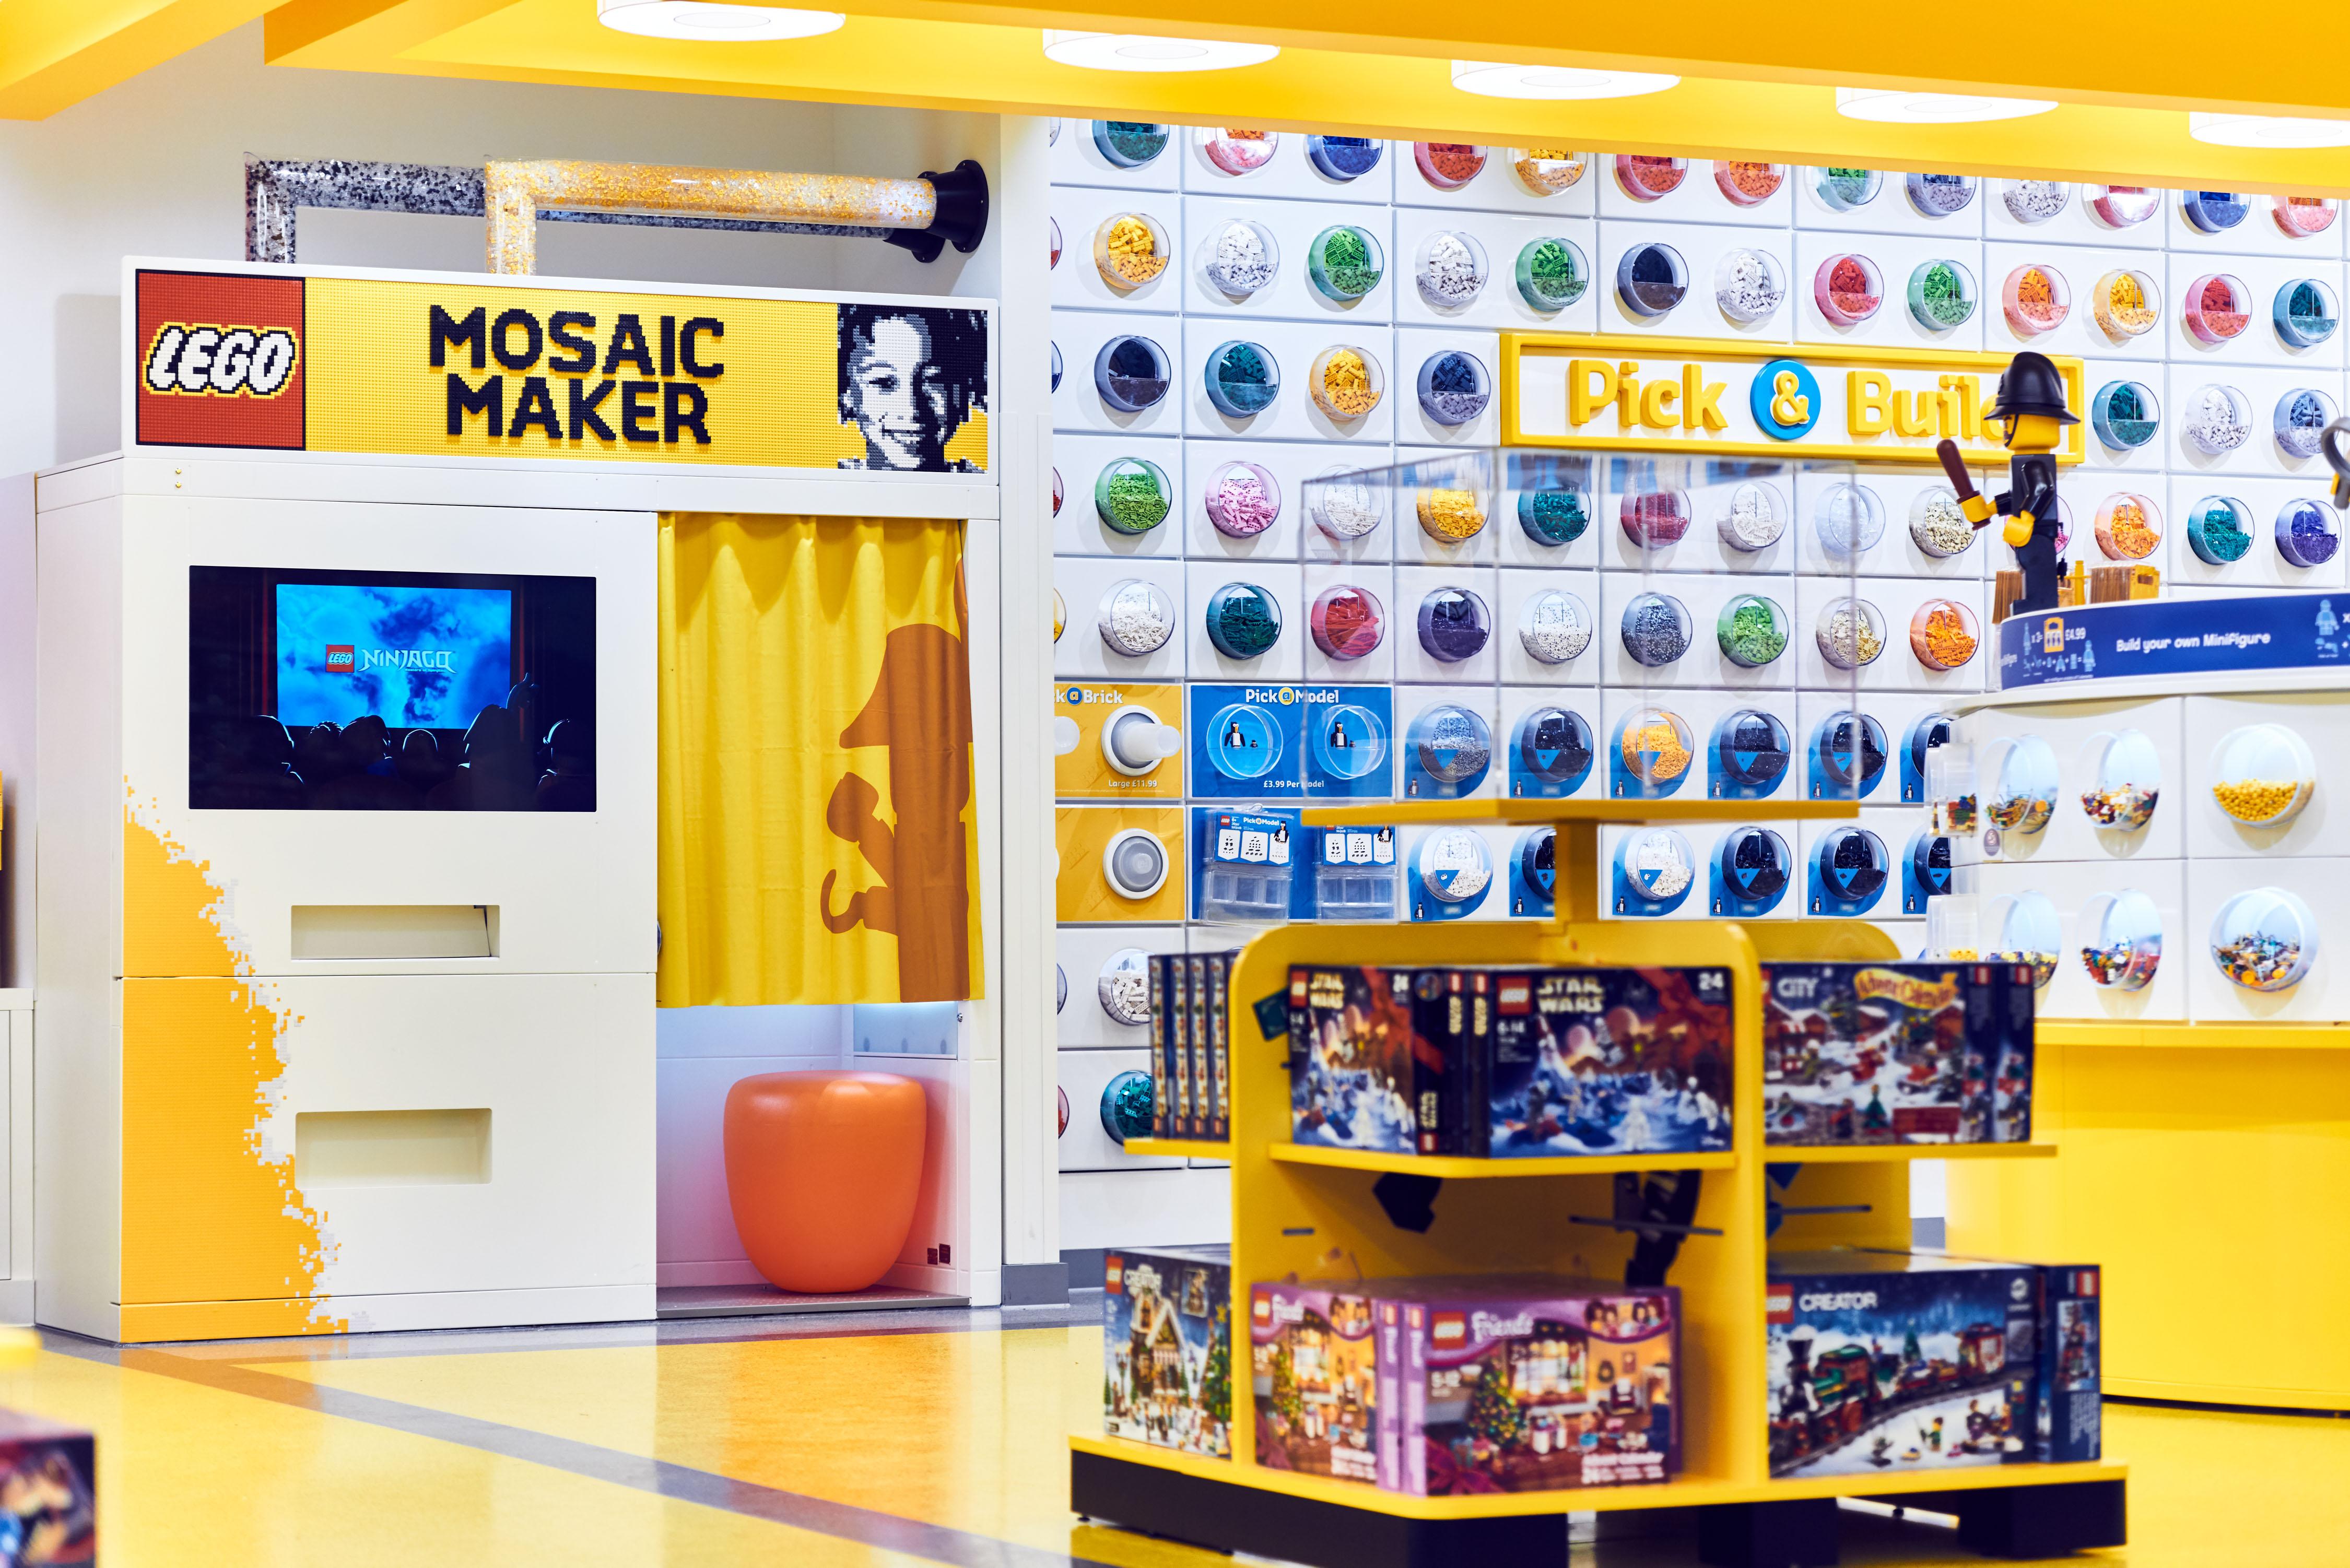 lego-mosaic-maker-2-lego-store-london-embargo-17-11-16-copyright-lego